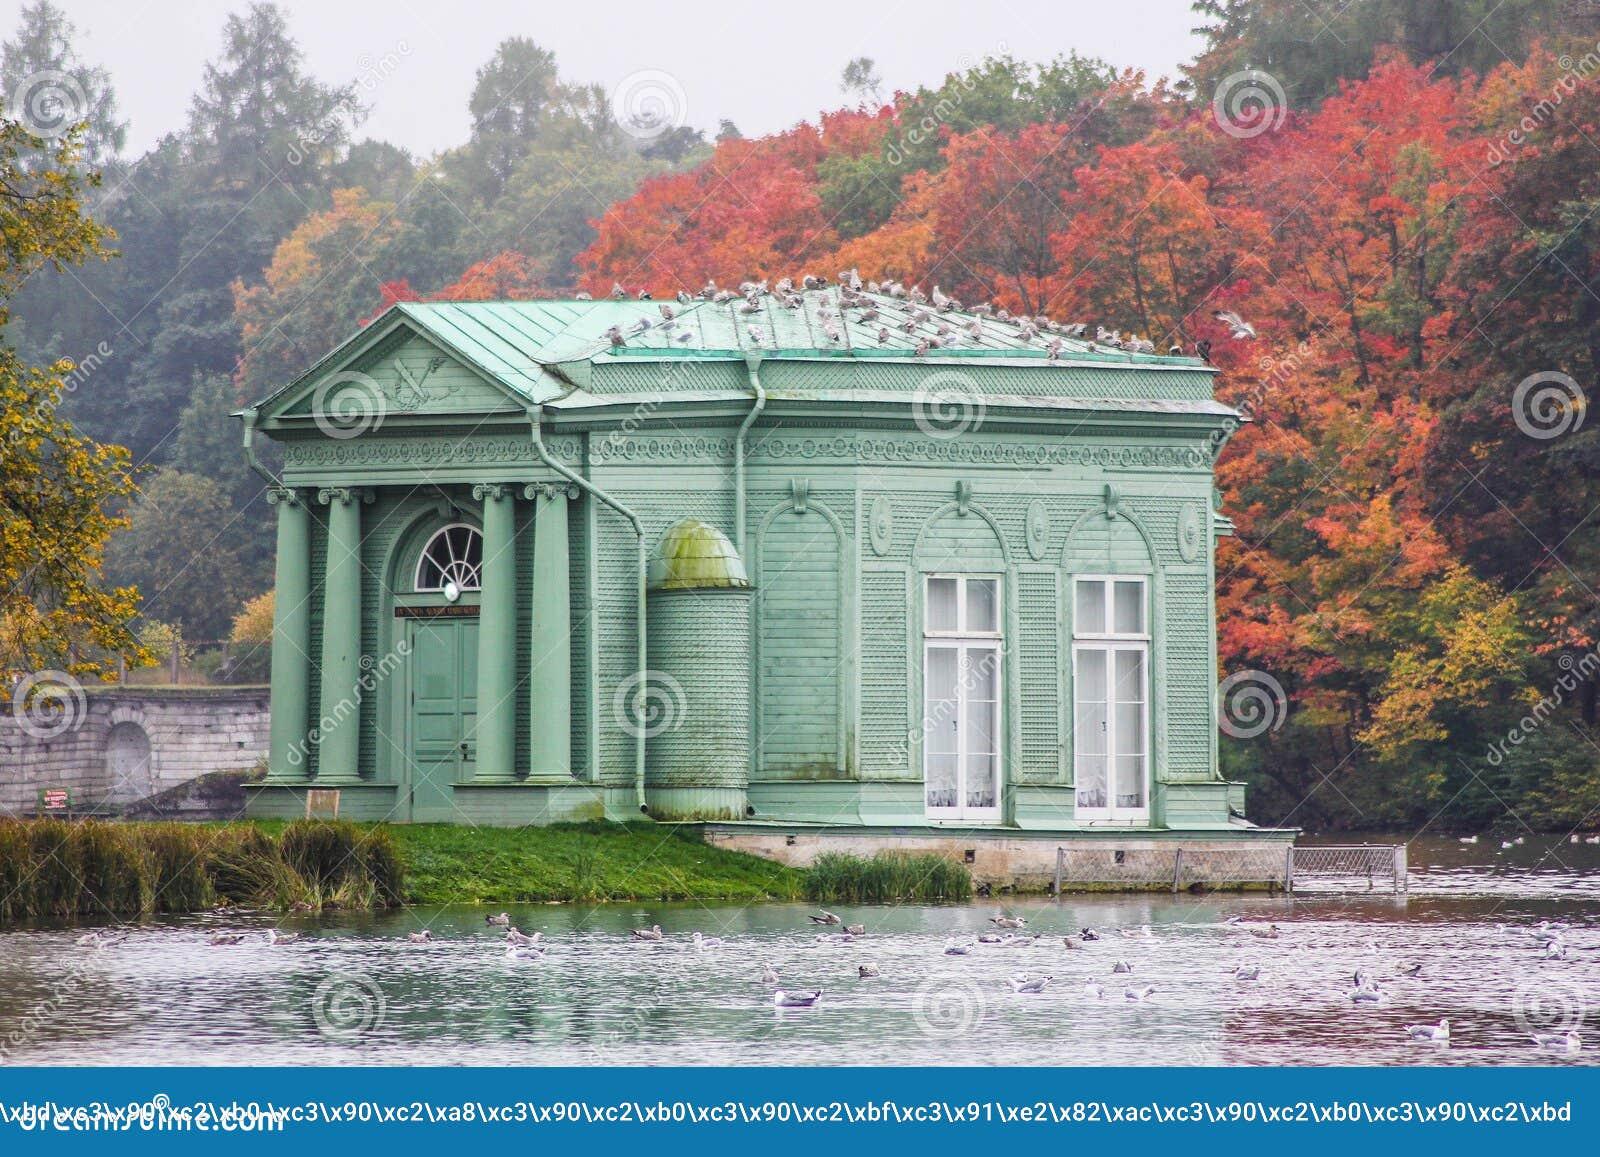 Pavilion of Love